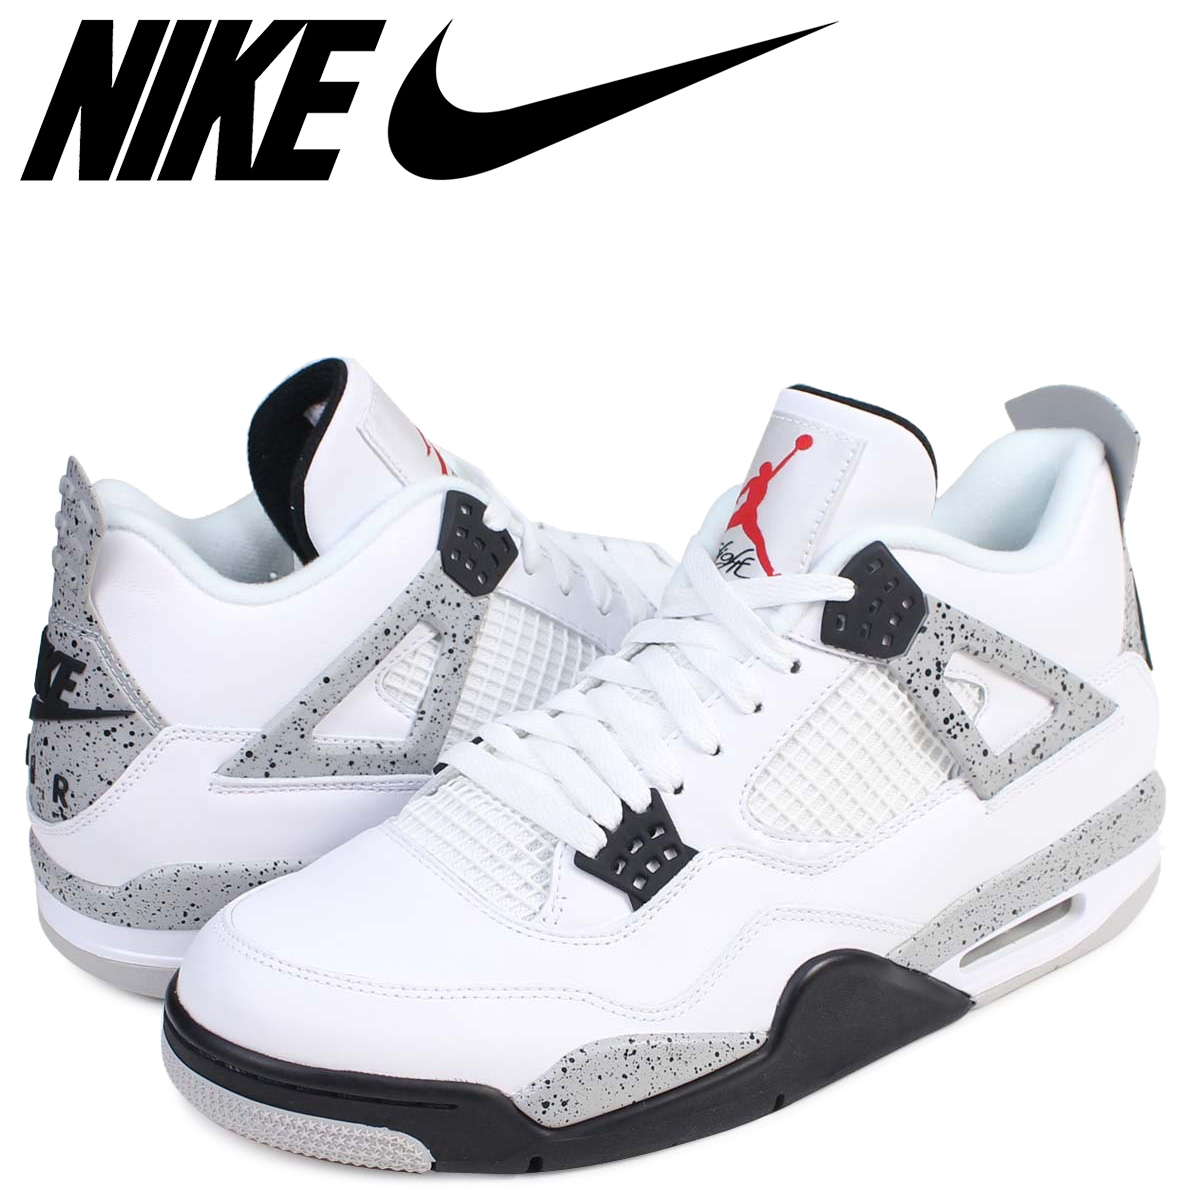 92bac85d4b3b ALLSPORTS  NIKE Nike Air Jordan 4 nostalgic sneakers AIR JORDAN 4 RETRO OG  WHITE CEMENT 840